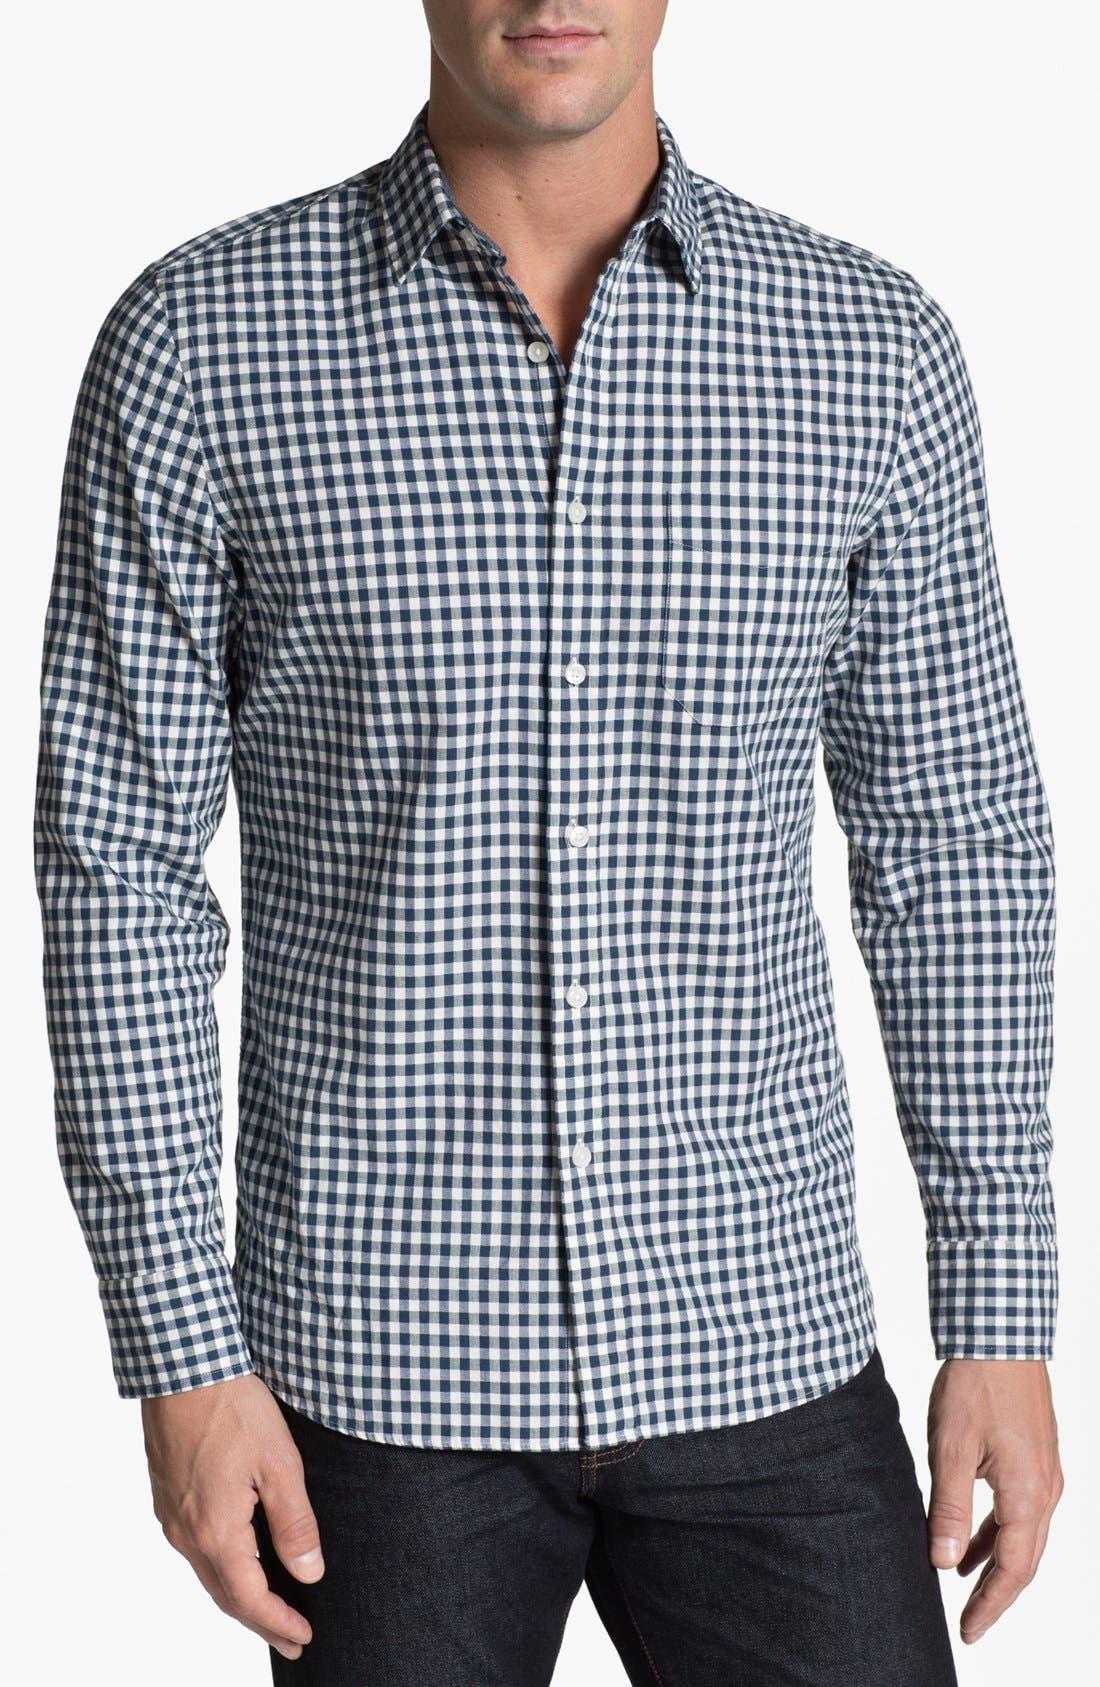 Main Image - Wallin & Bros. Gingham Trim Fit Sport Shirt